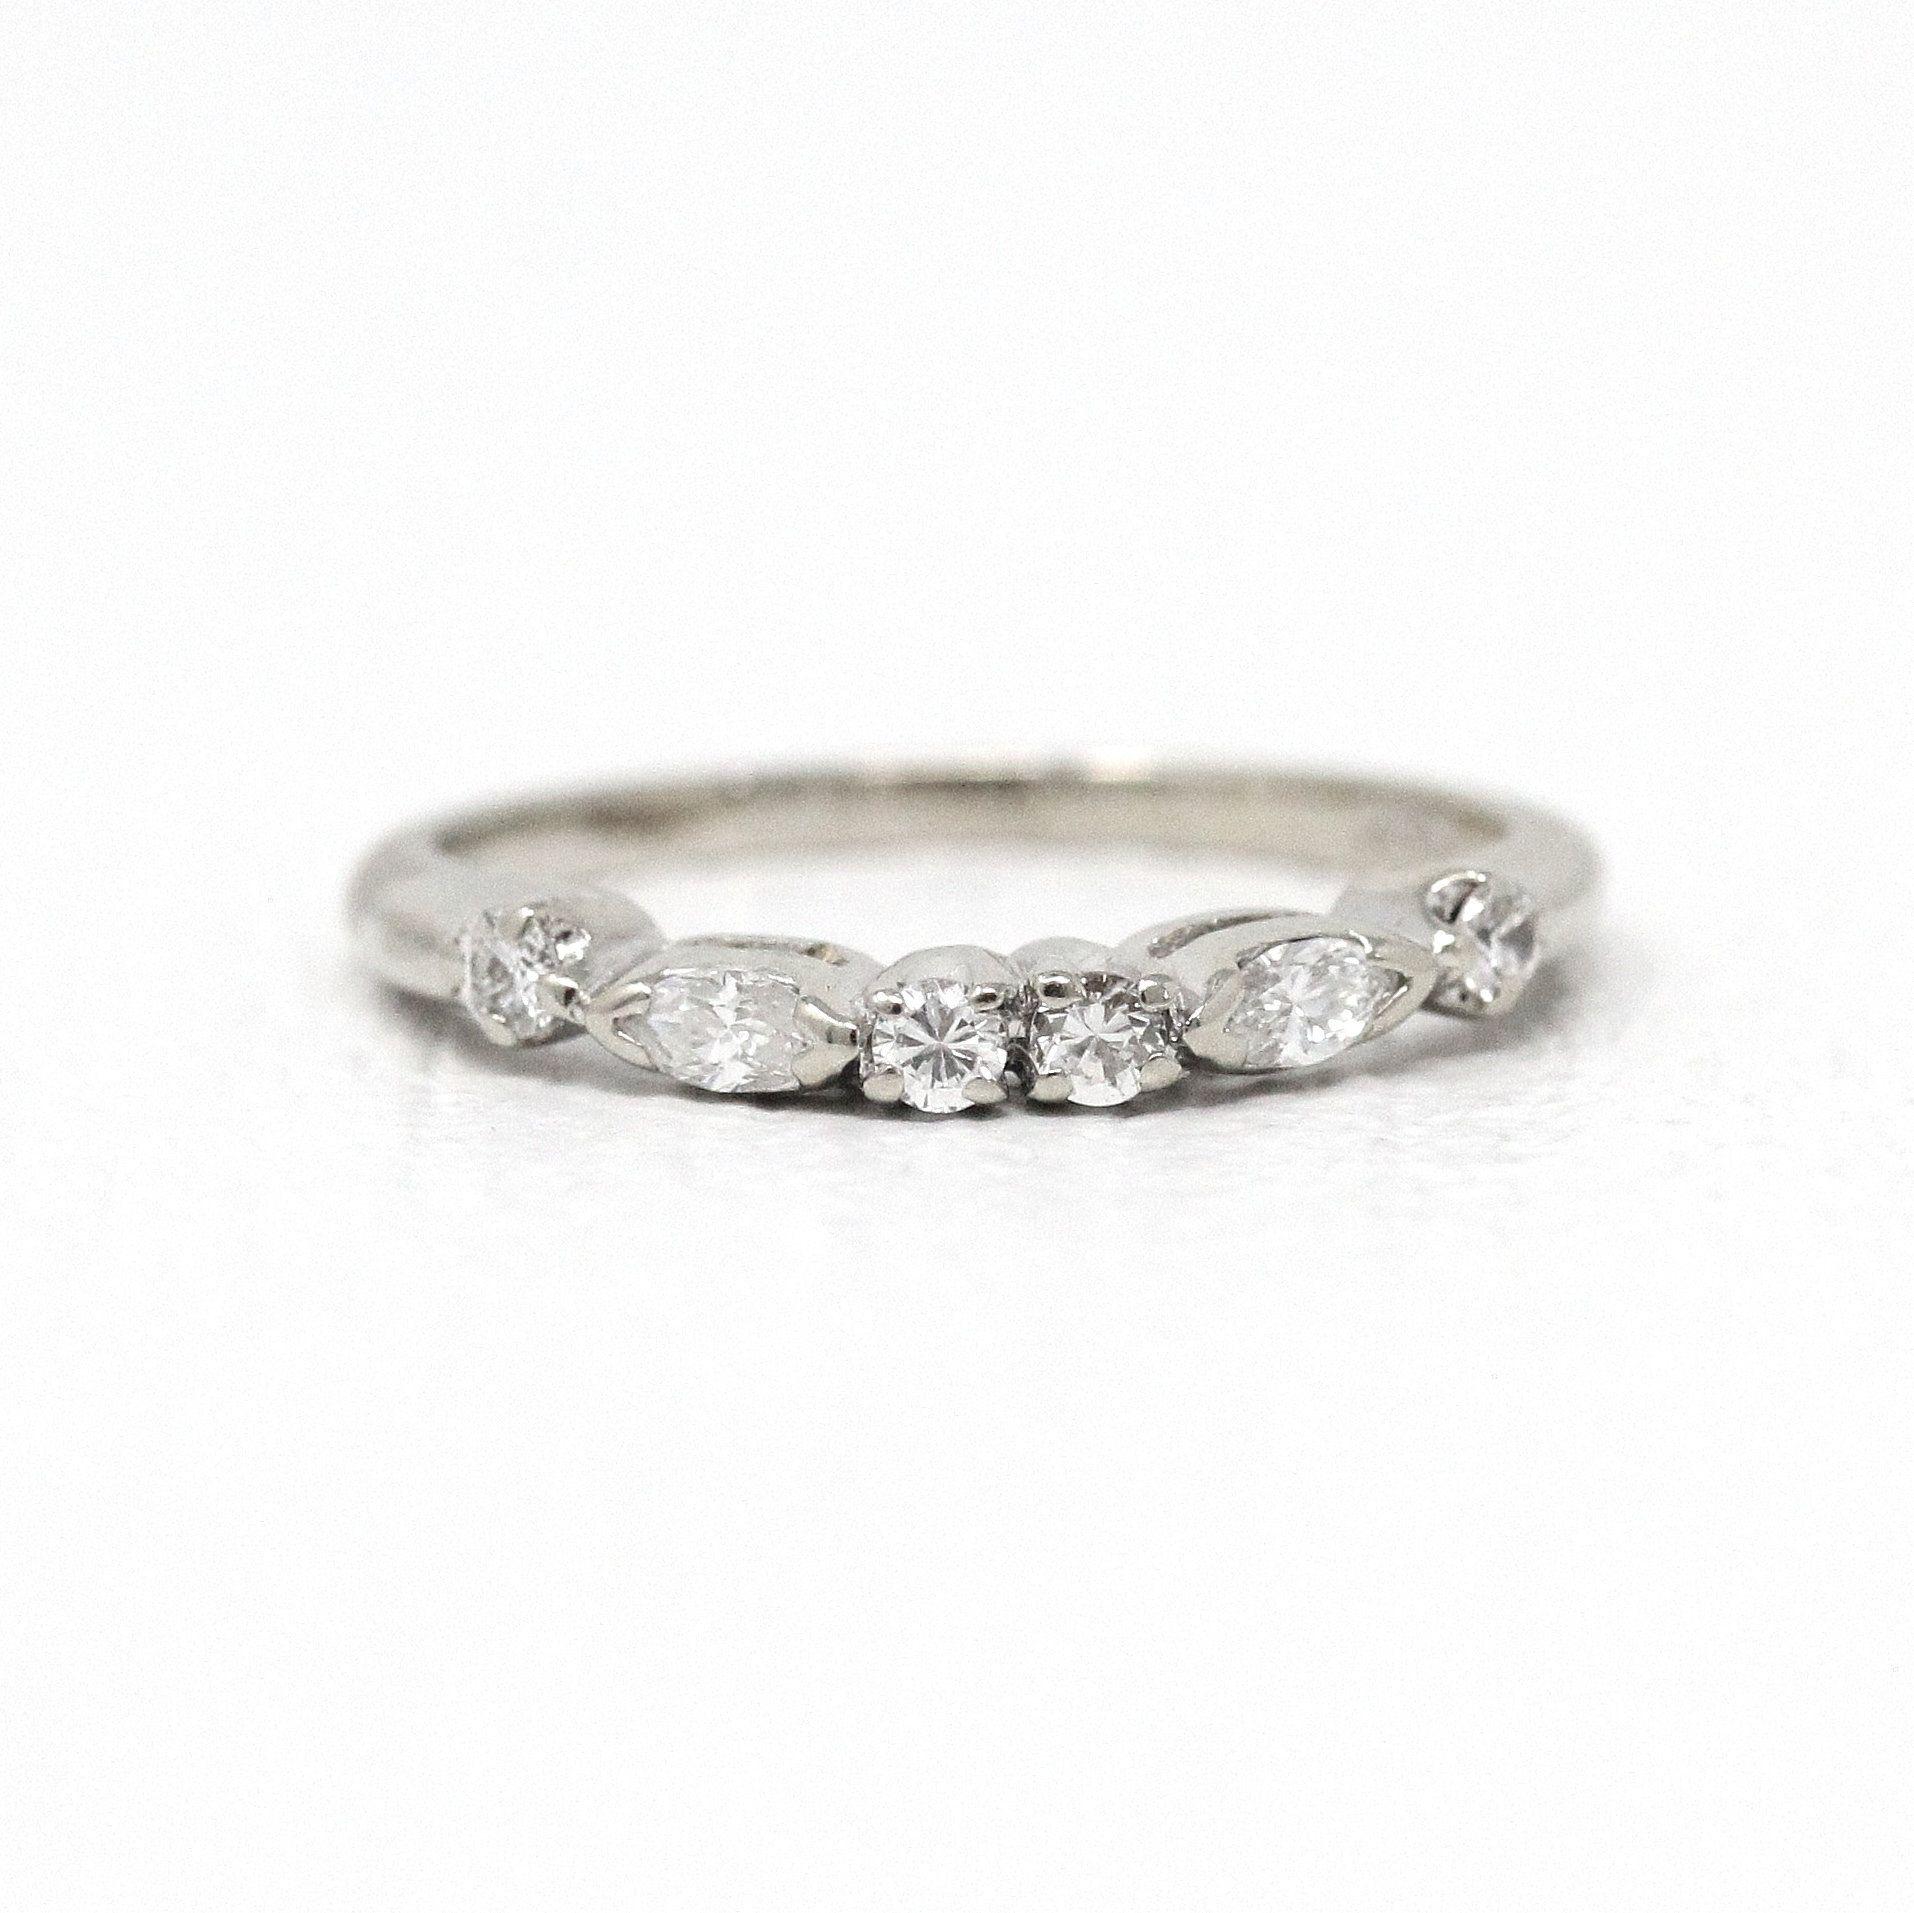 Diamond Wedding Band Vintage 14k White Gold Curved 1960s